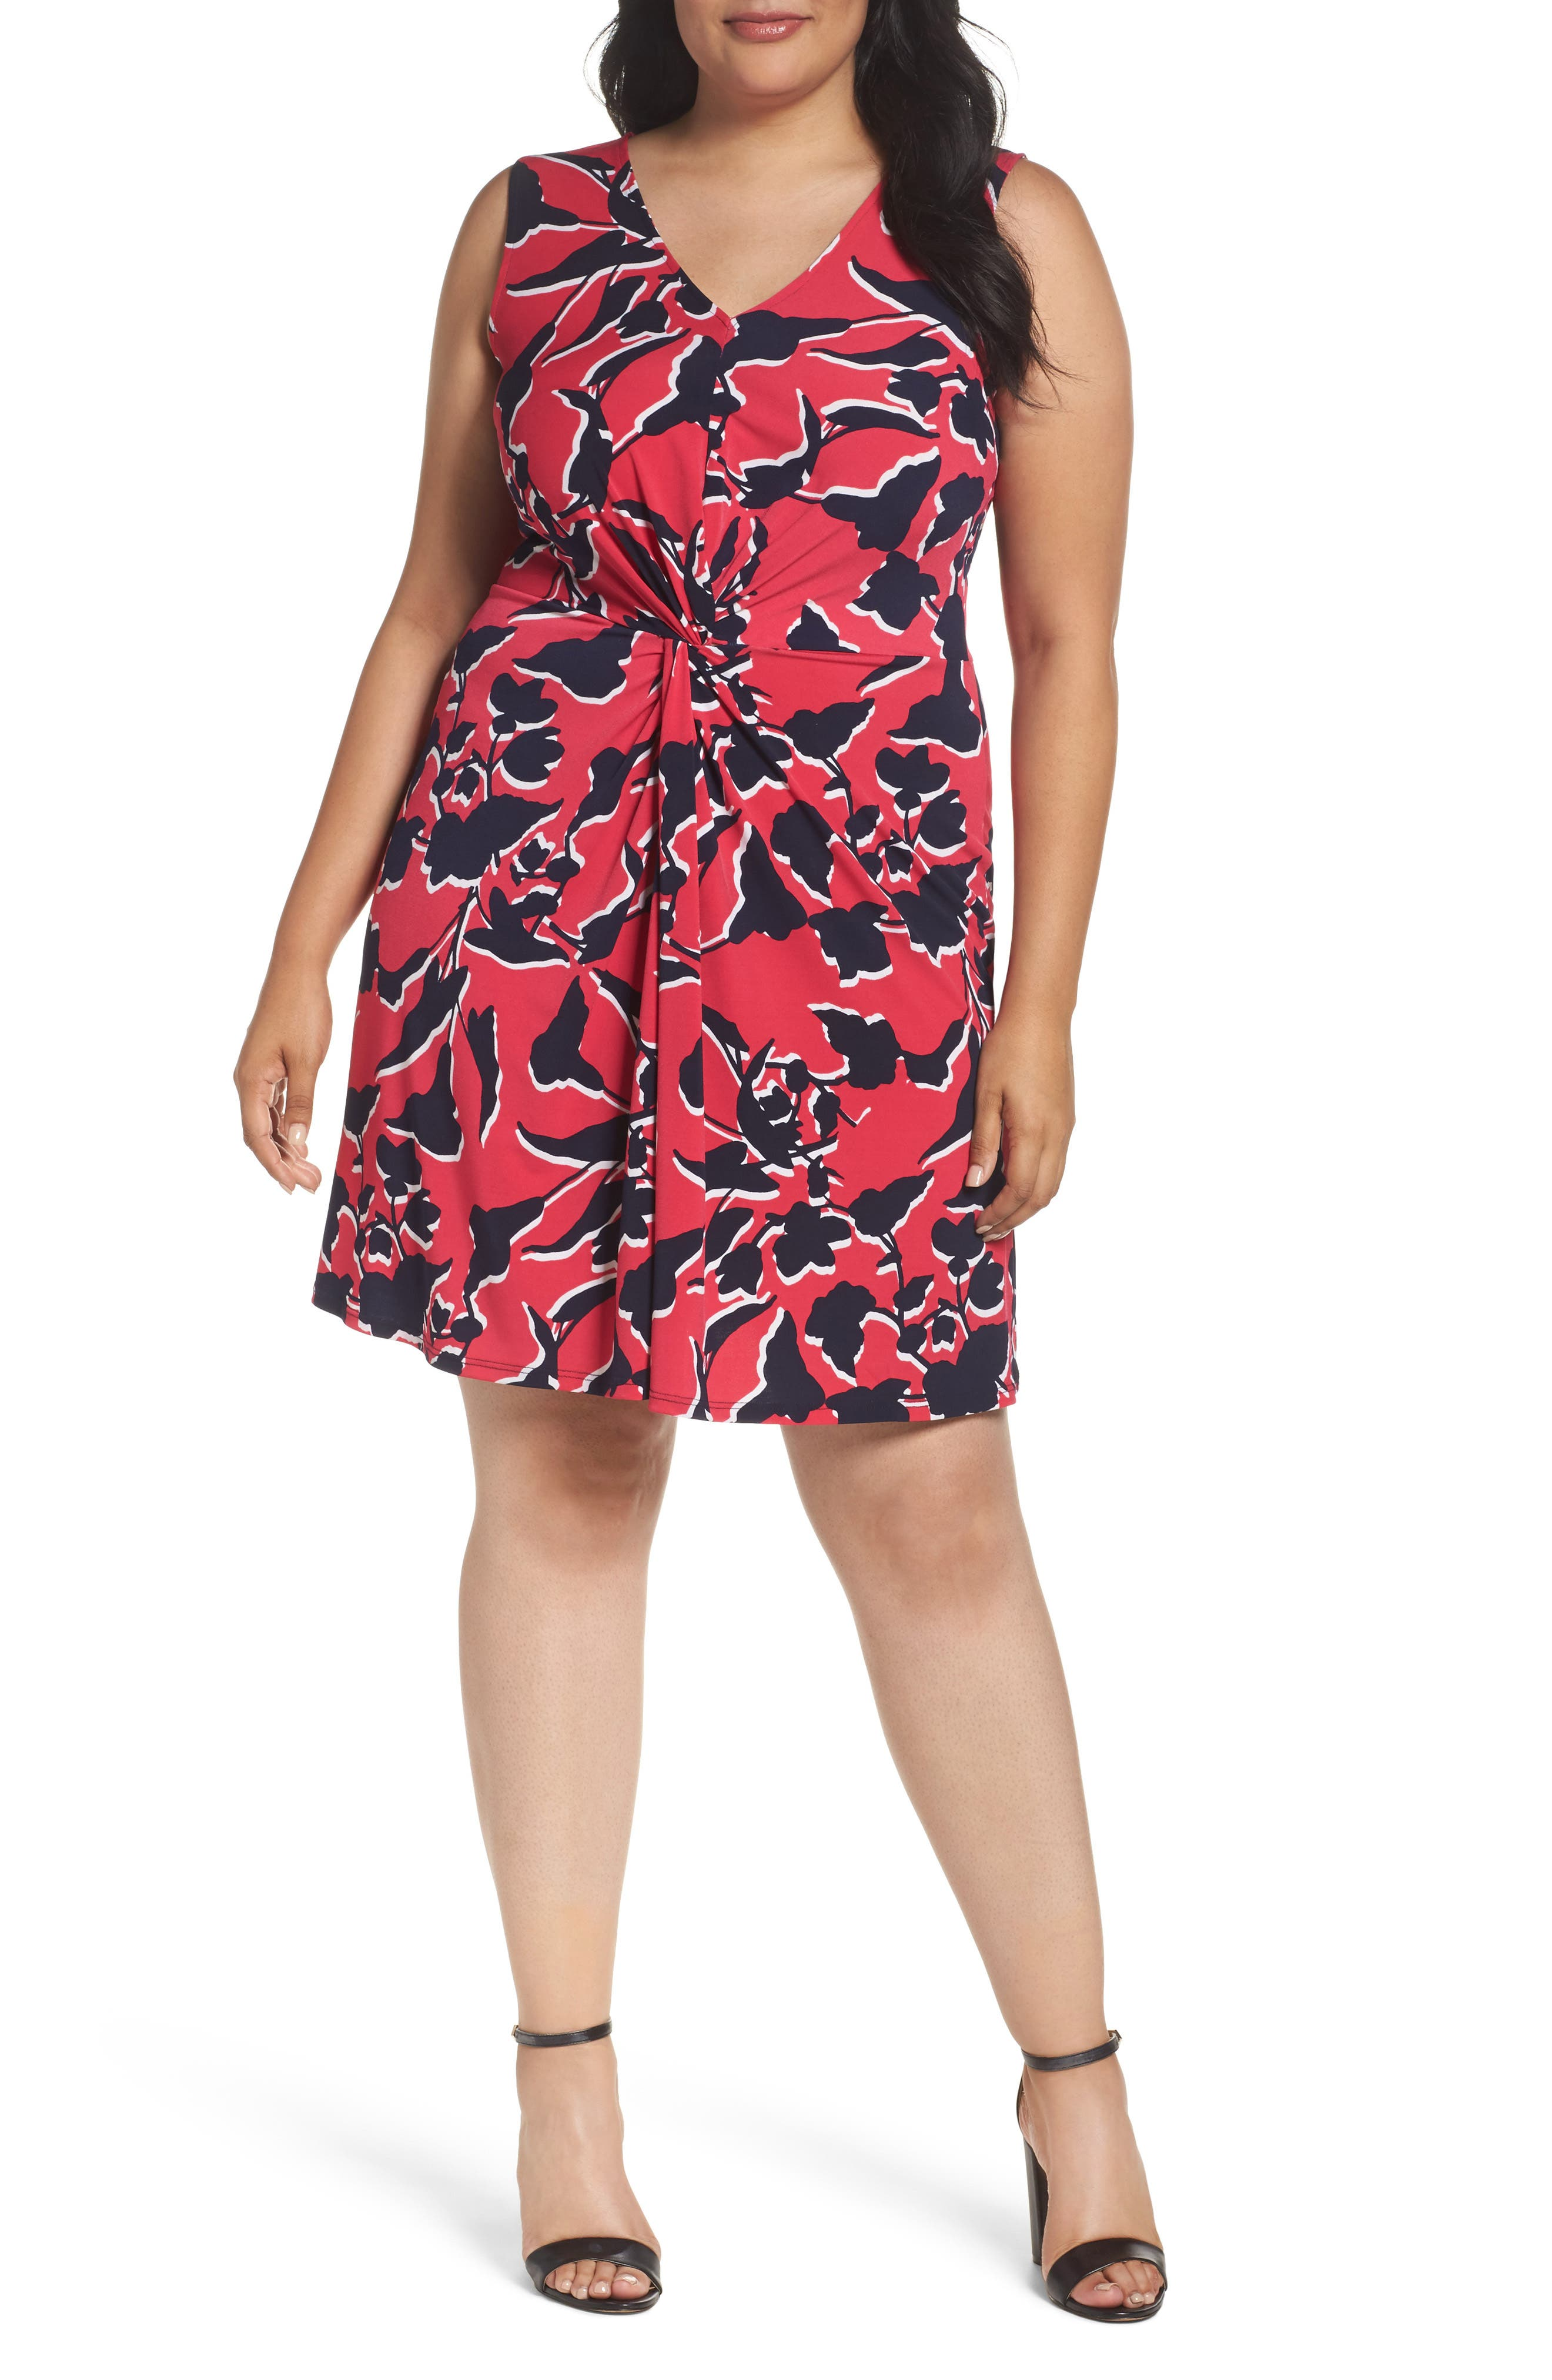 Alternate Image 1 Selected - Leota Twist Front Jersey Dress (Plus Size)